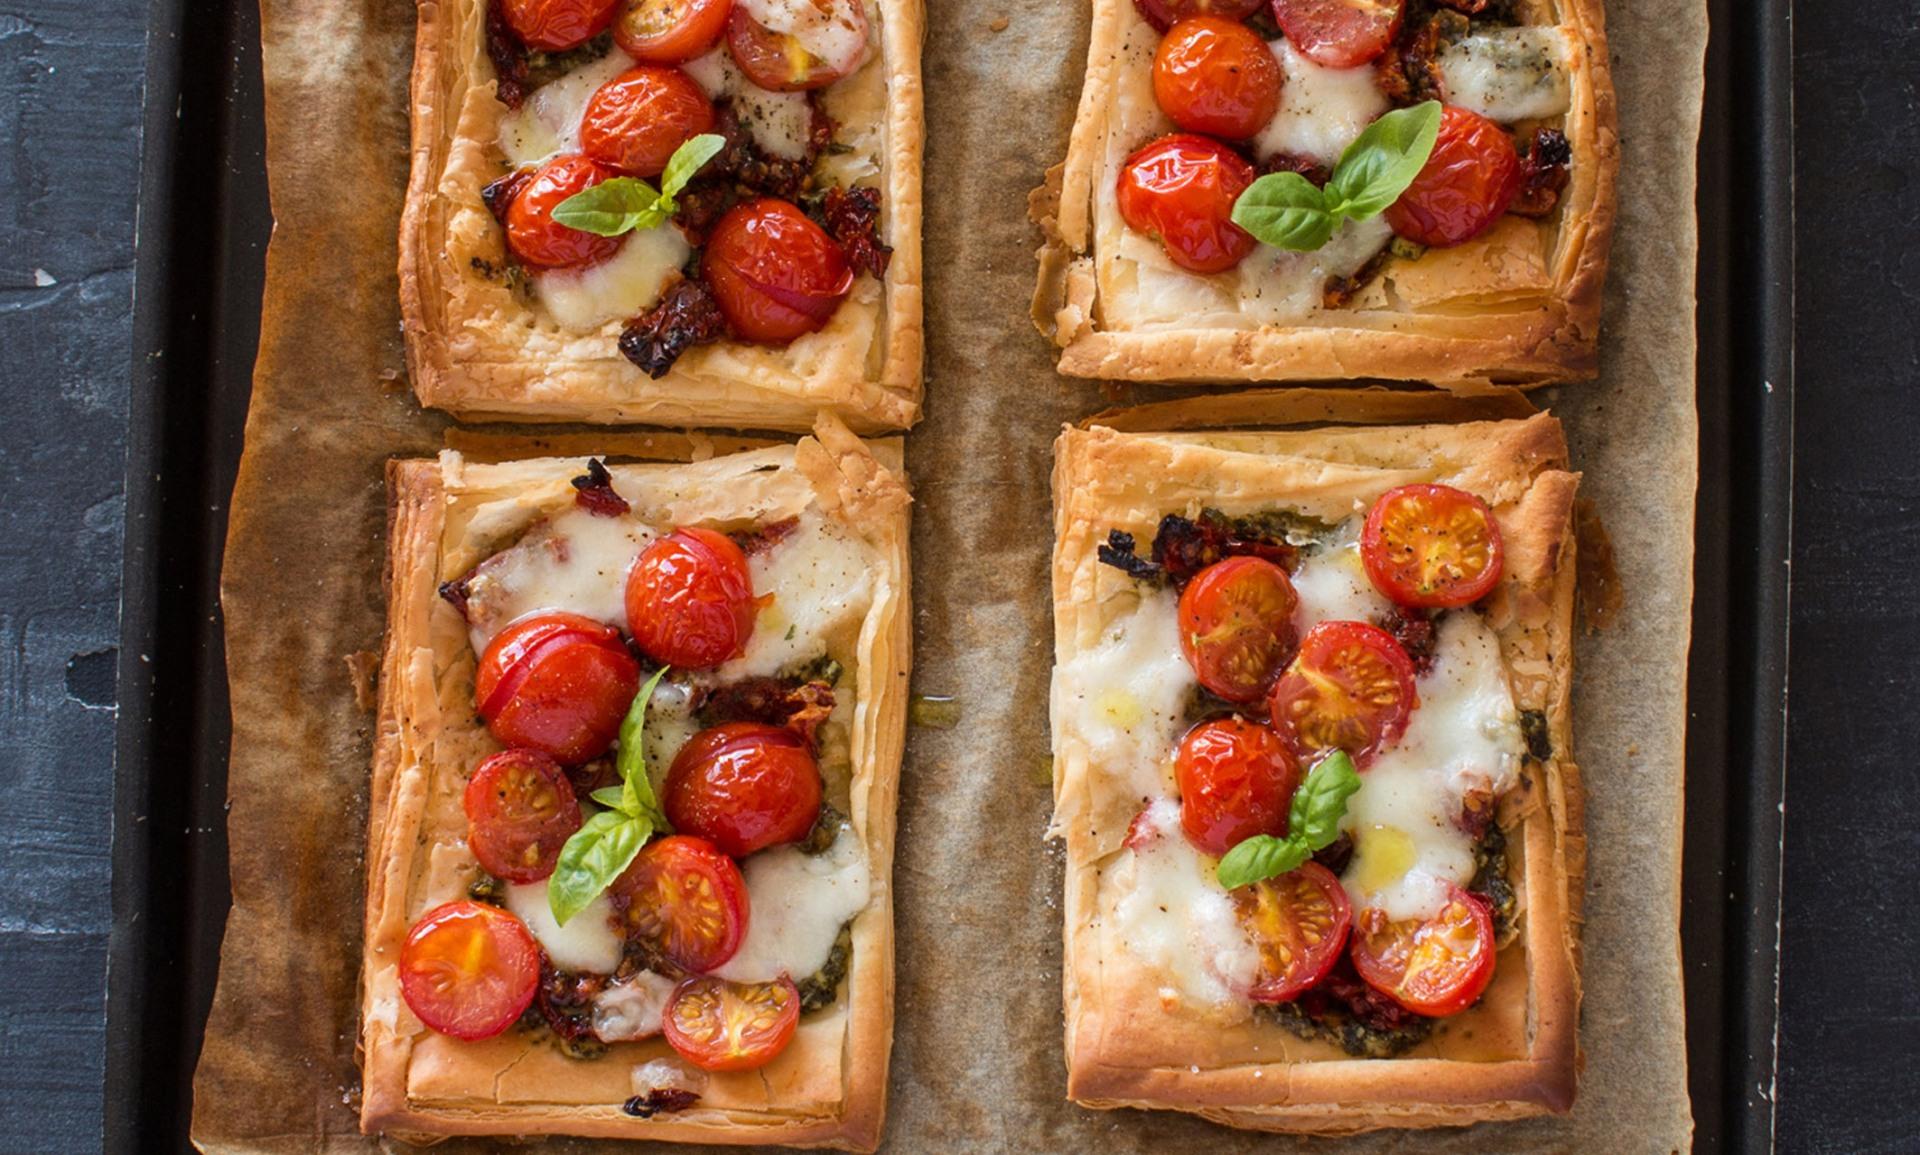 Isle of Wight Tomato Lunchbox Tarts